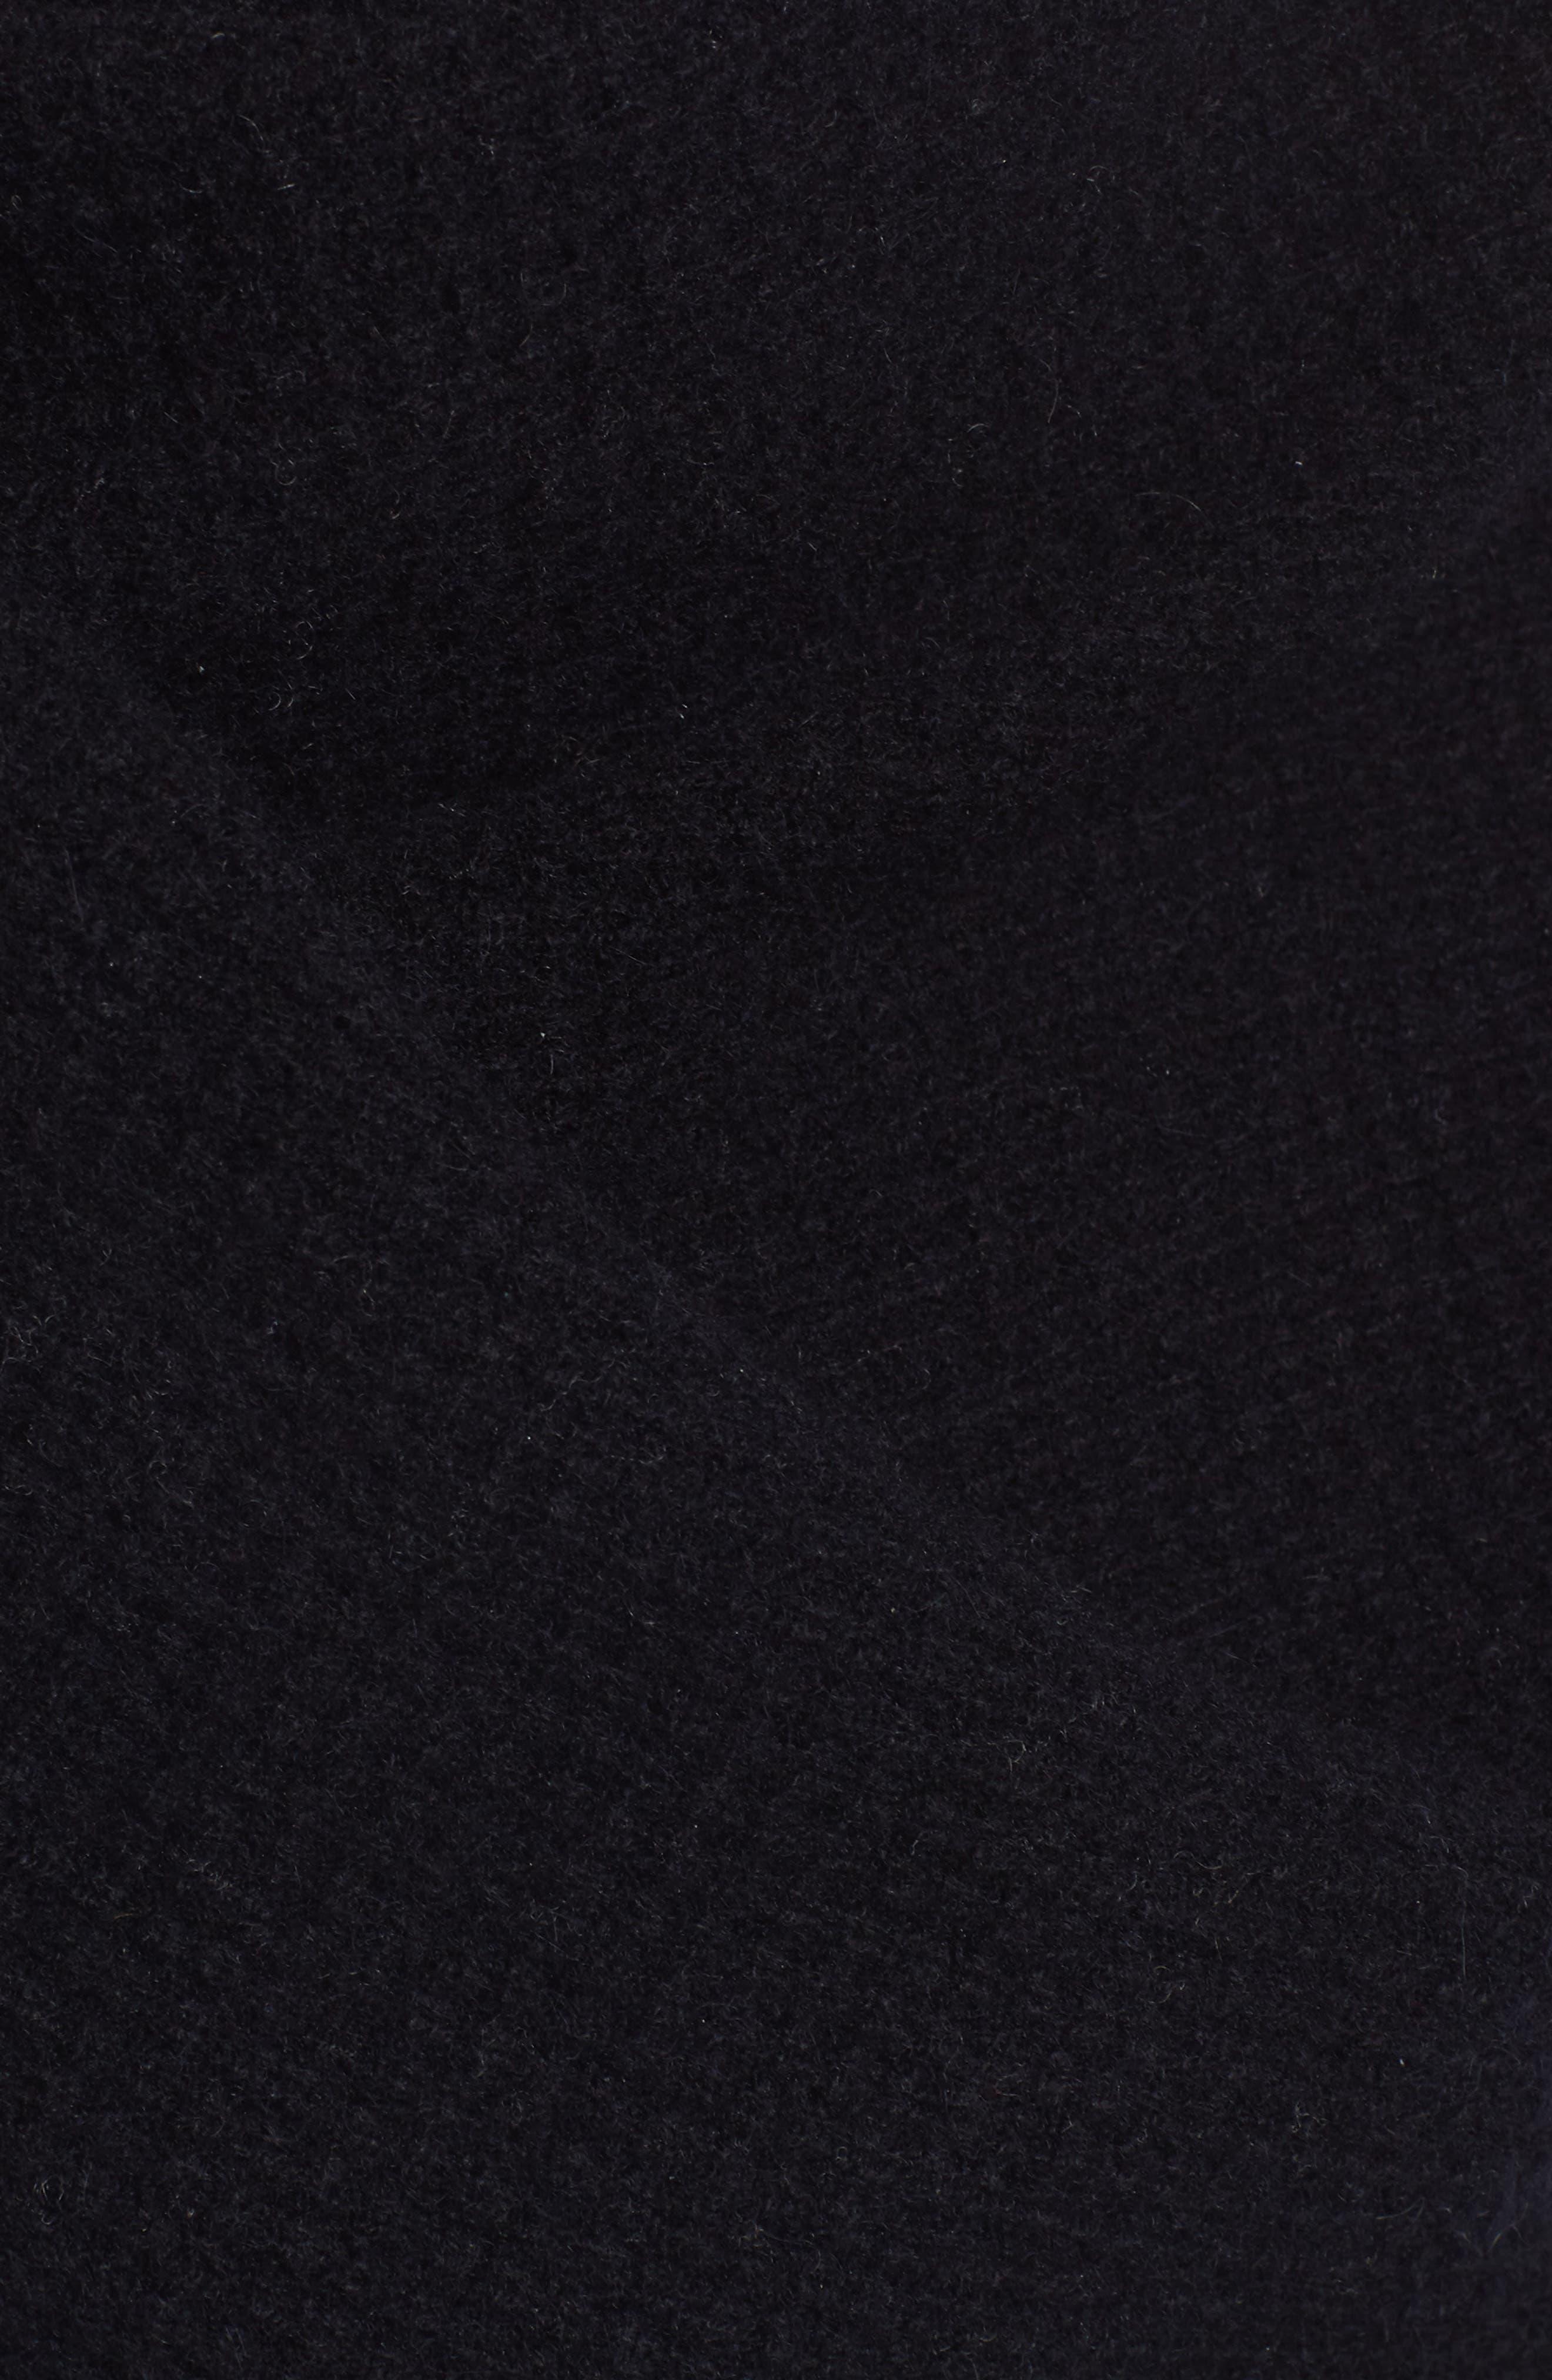 Waffle Knit Cashmere Wrap,                             Alternate thumbnail 6, color,                             Black